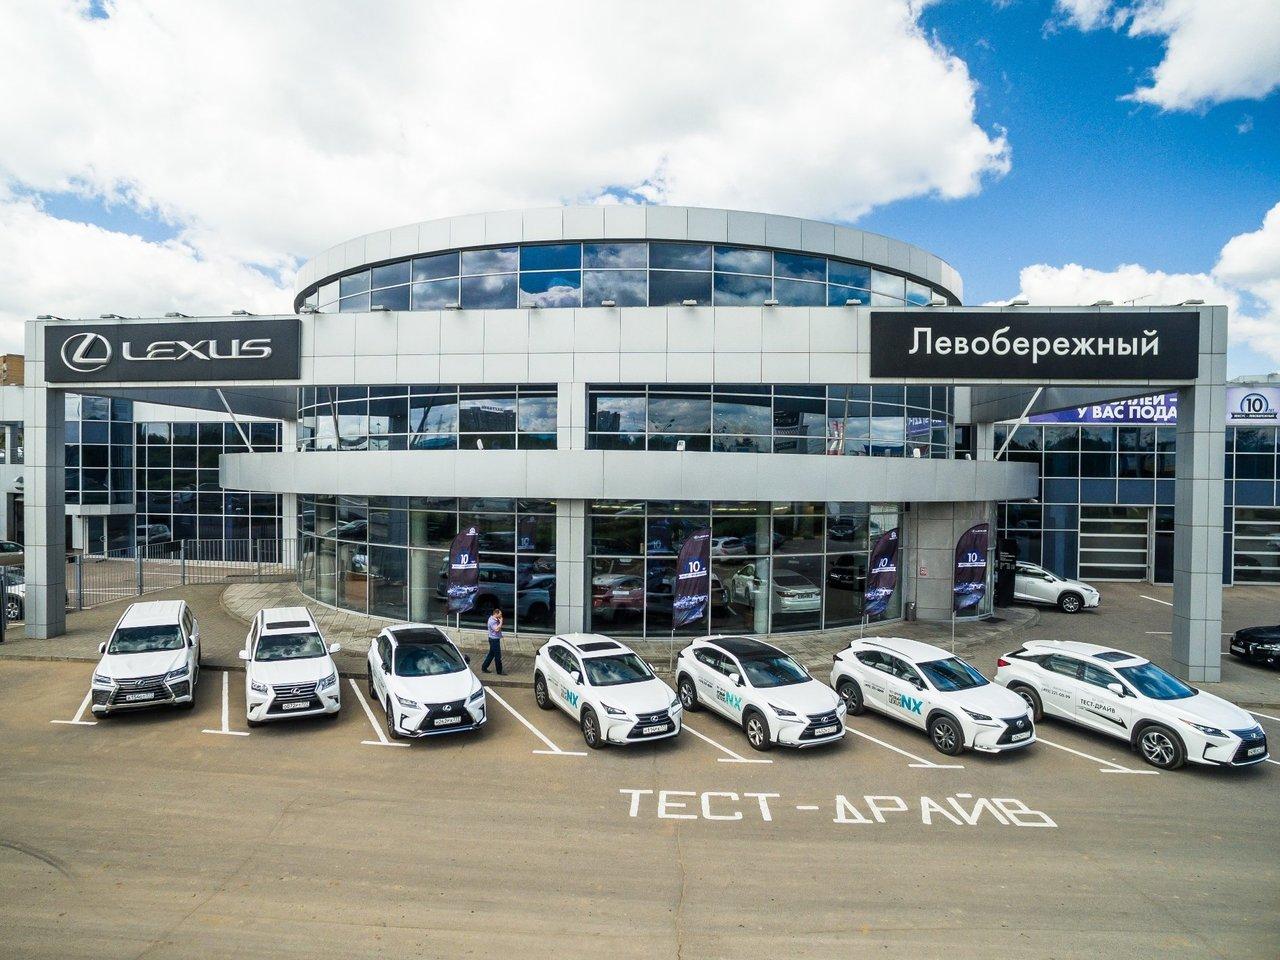 Автосалон lexus в москве автозалог липецка